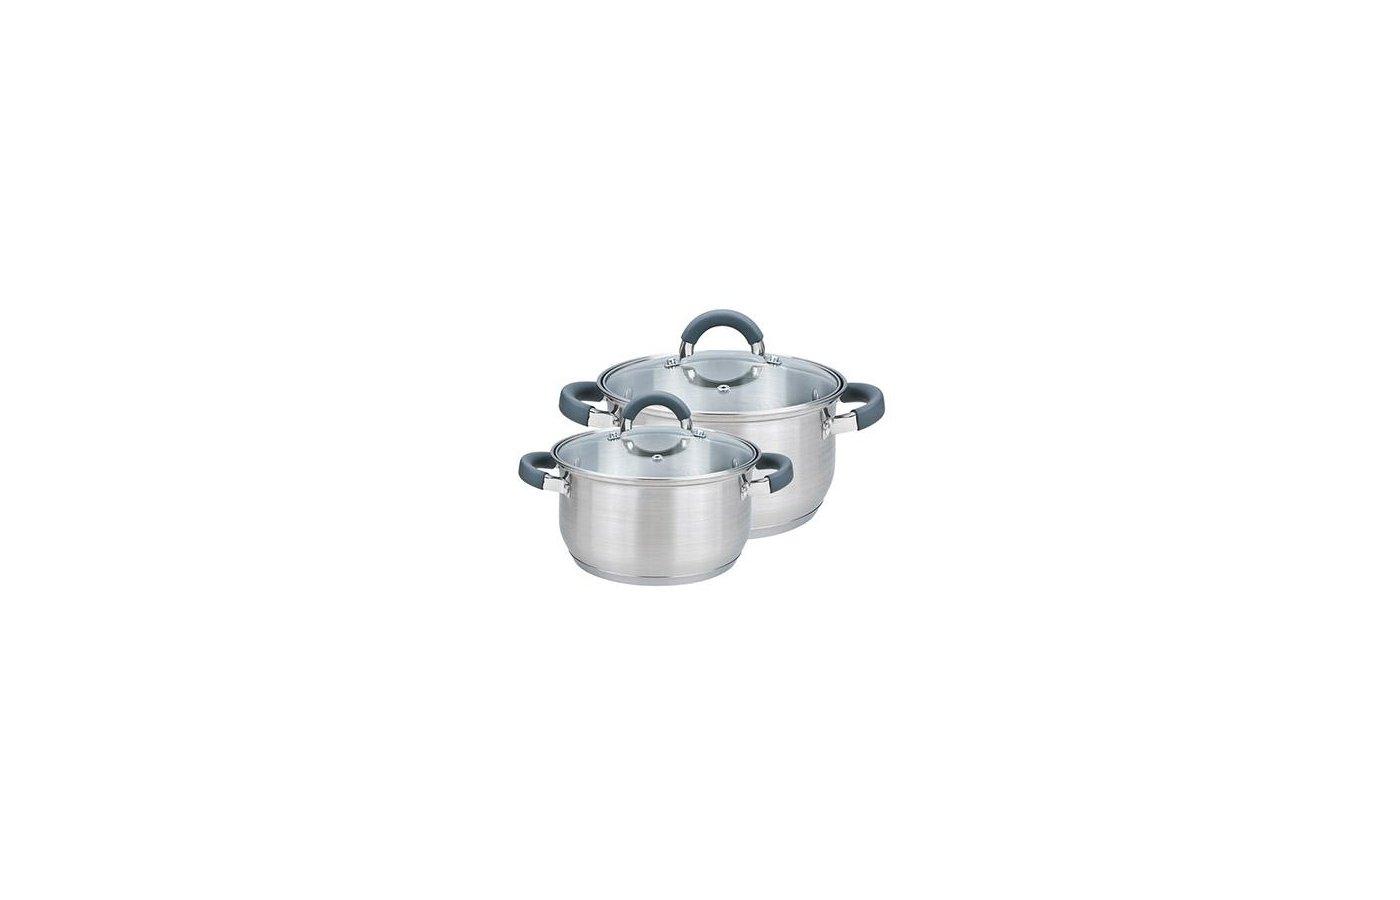 Набор посуды VETTA 822-008 Вена Набор кастрюль 2 кастр. (1.9л.+3.6л) со стекл. крышками